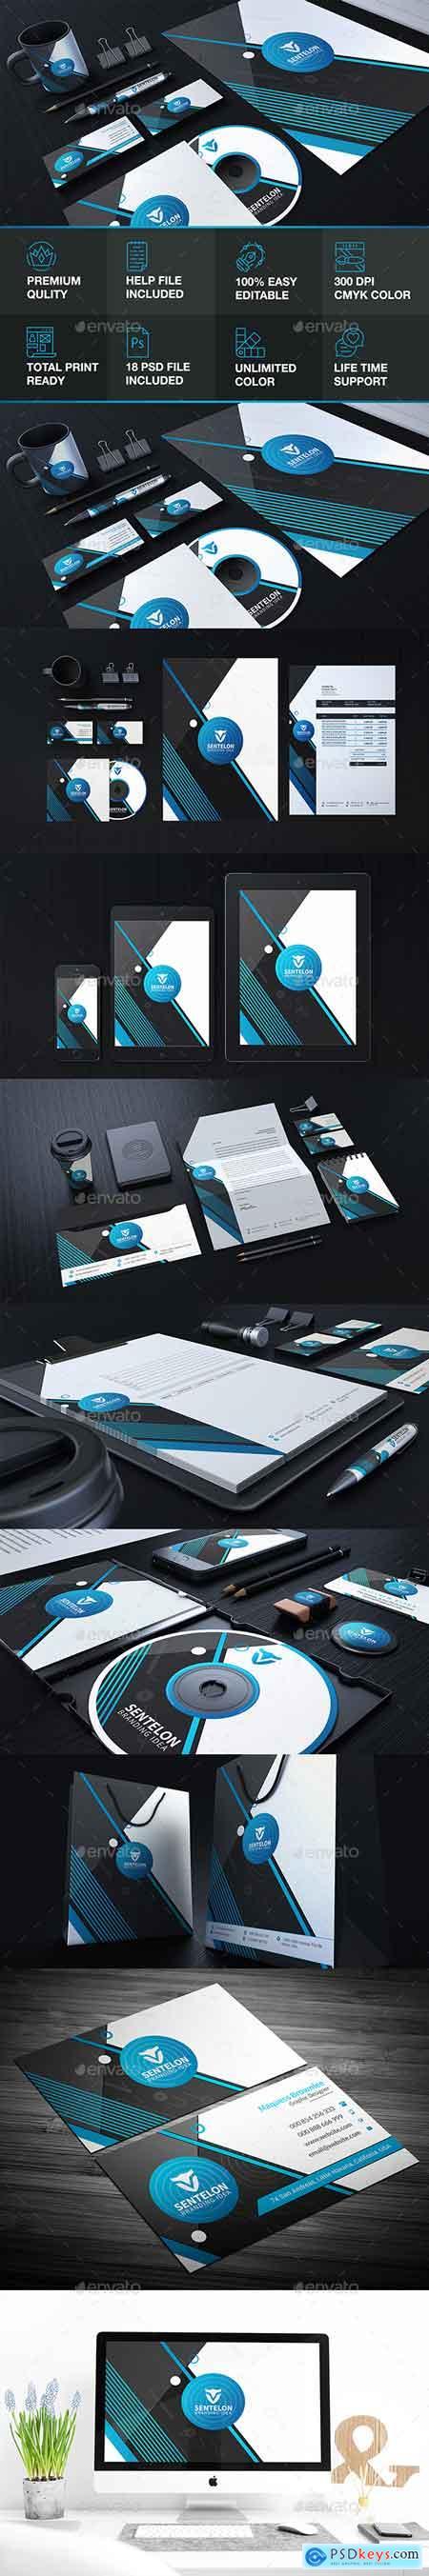 GraphicRiver Lentelon Corporate Stationary Identity